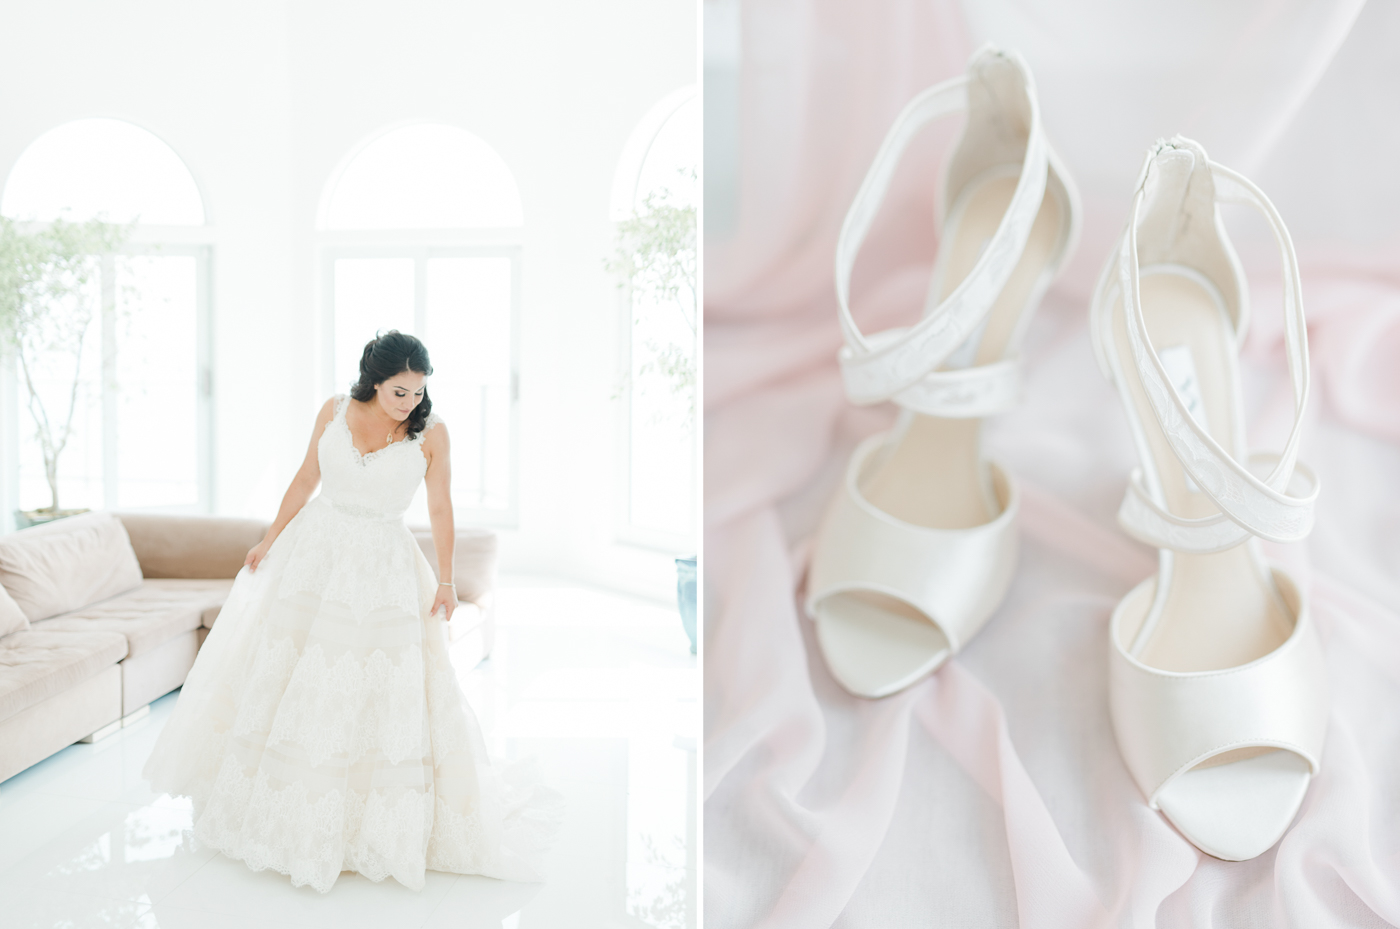 AKP_S&F_Malibu_Wedding_Fine_Art_Photography_Los_Angeles-4_wedding_shoes.jpg